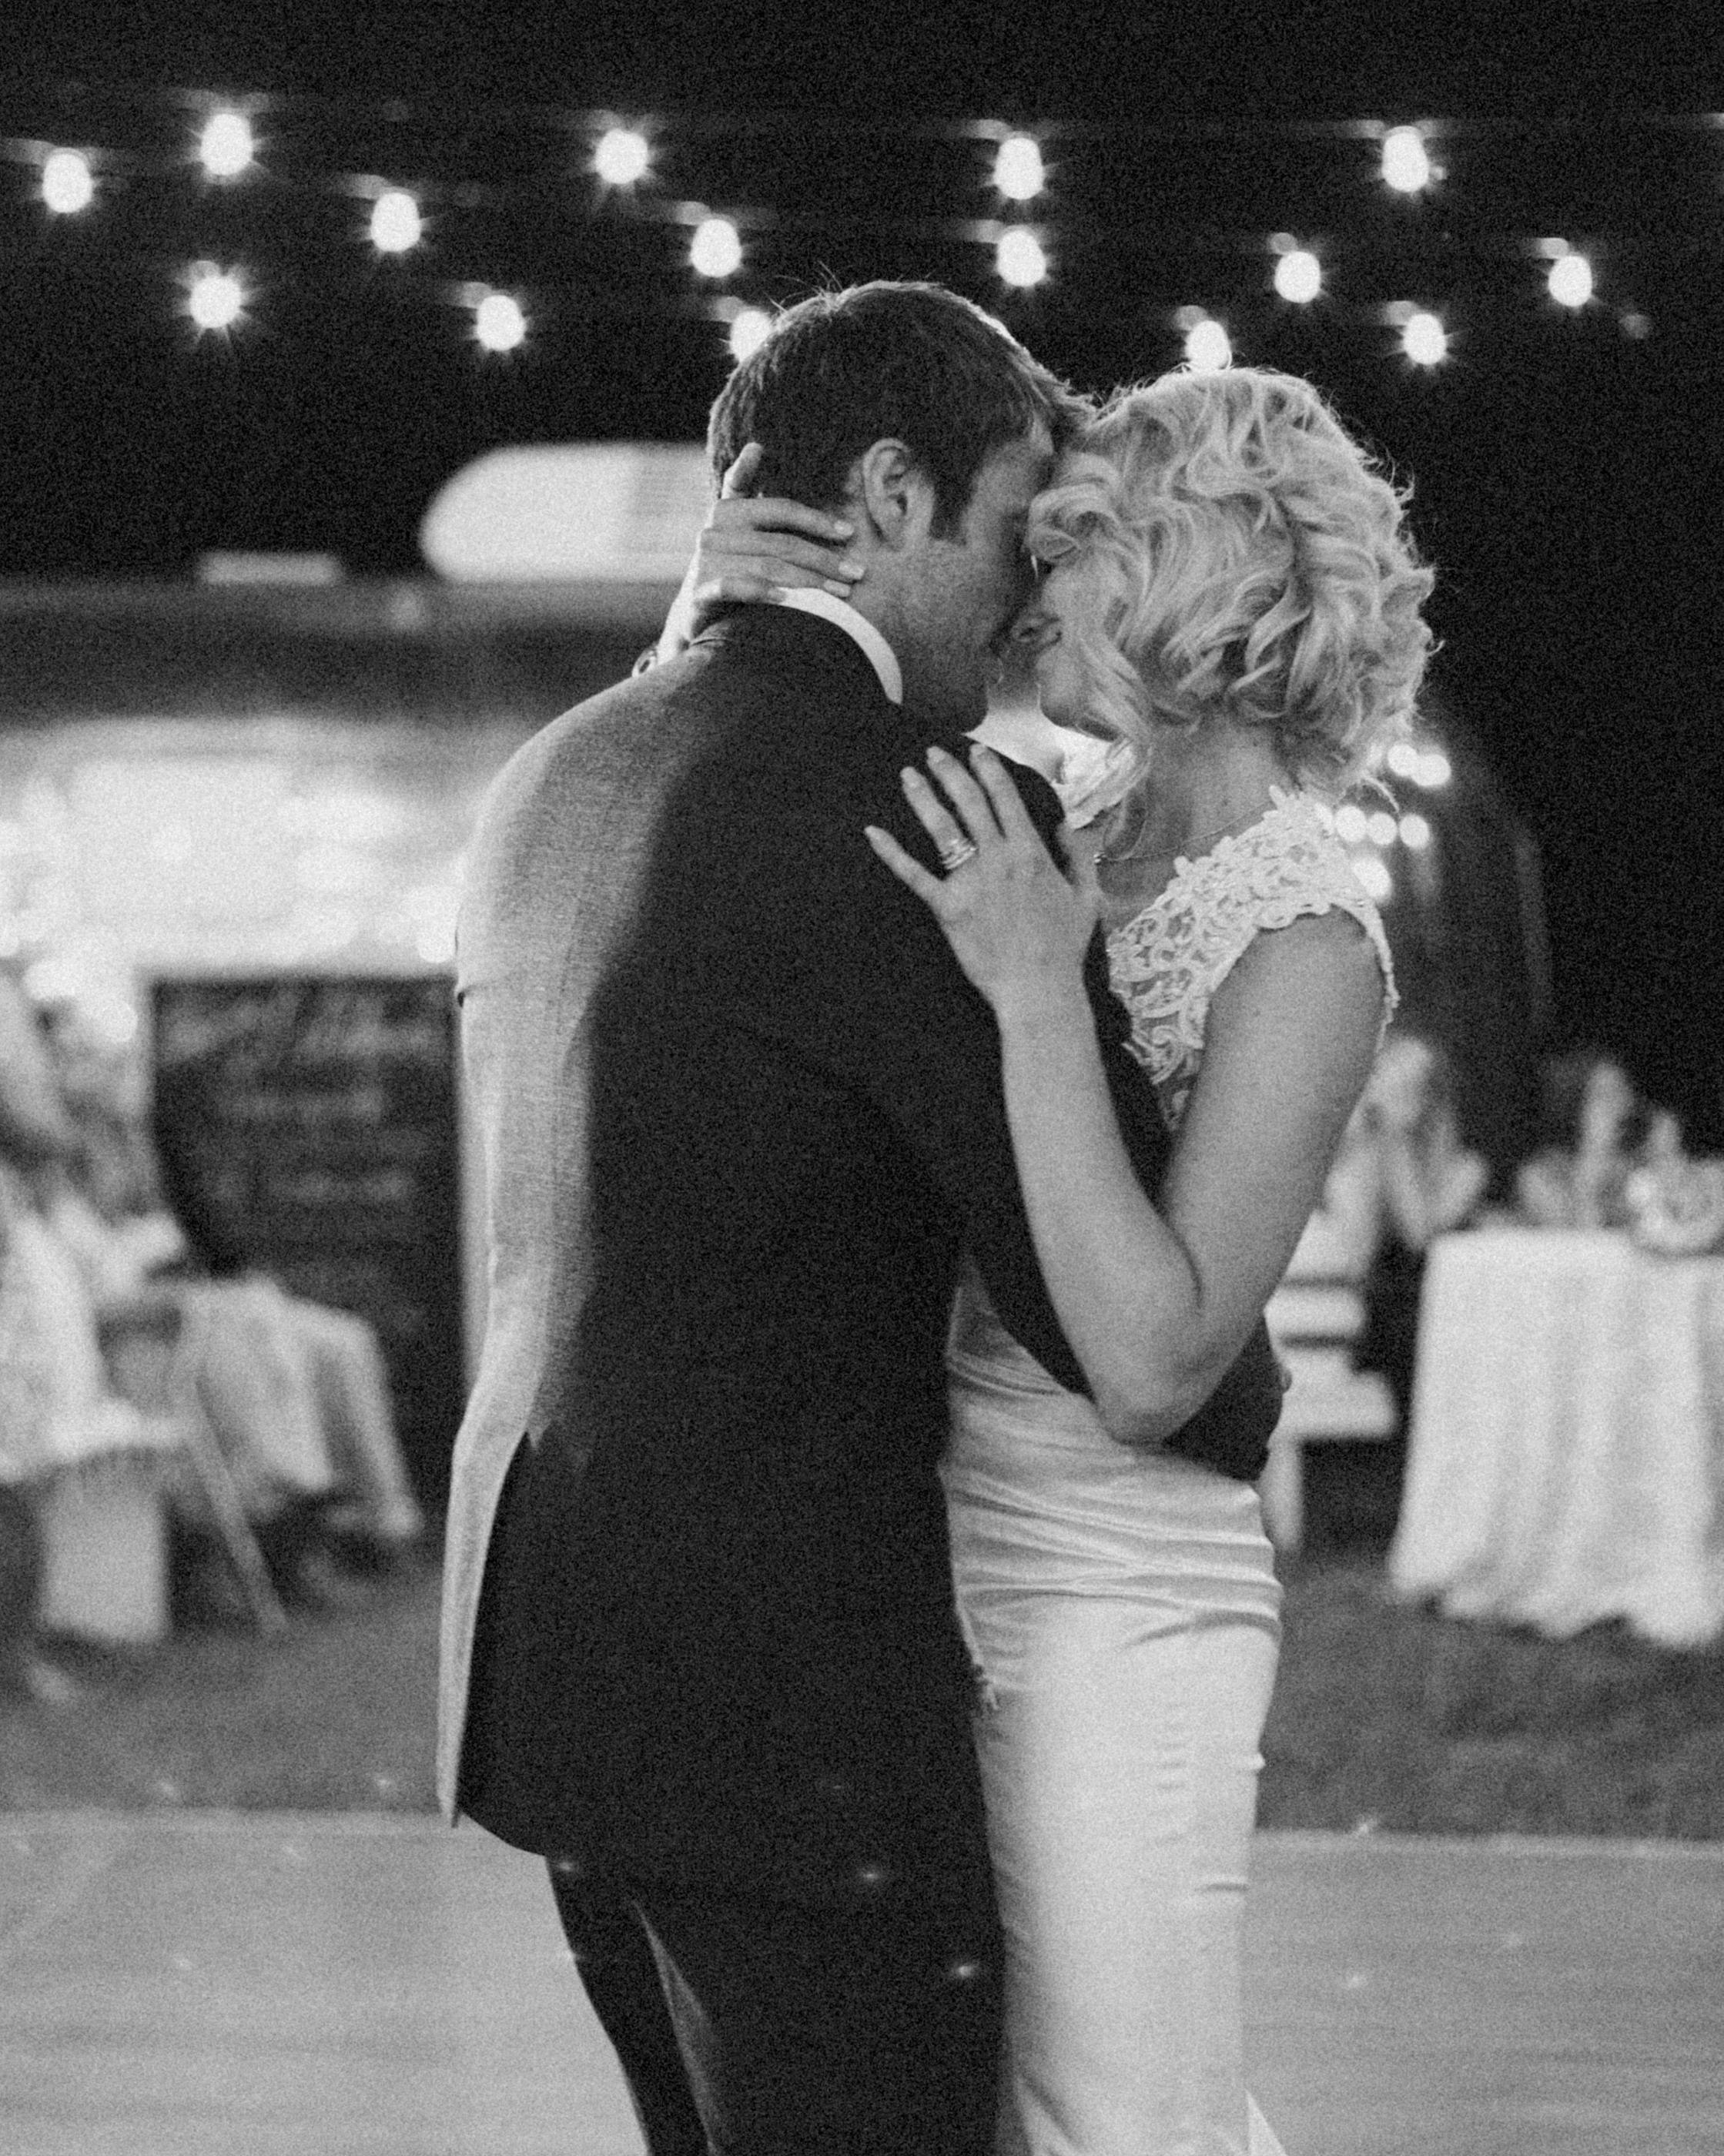 leah-michael-wedding-firstdance-28662-s111861-0515.jpg